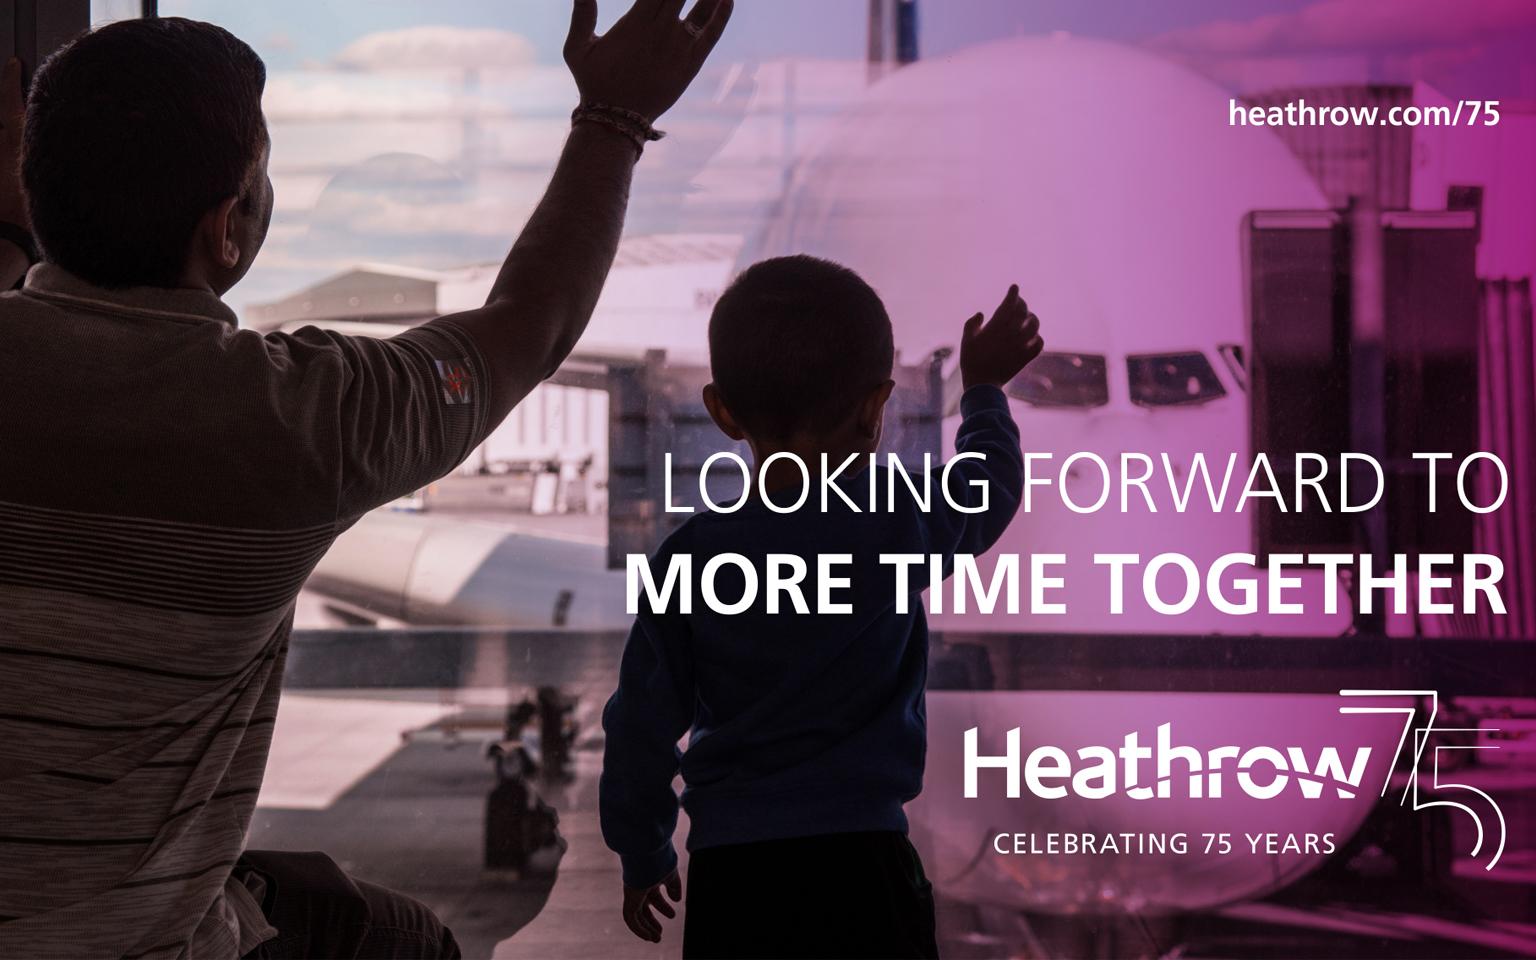 Heathrow Feature Image